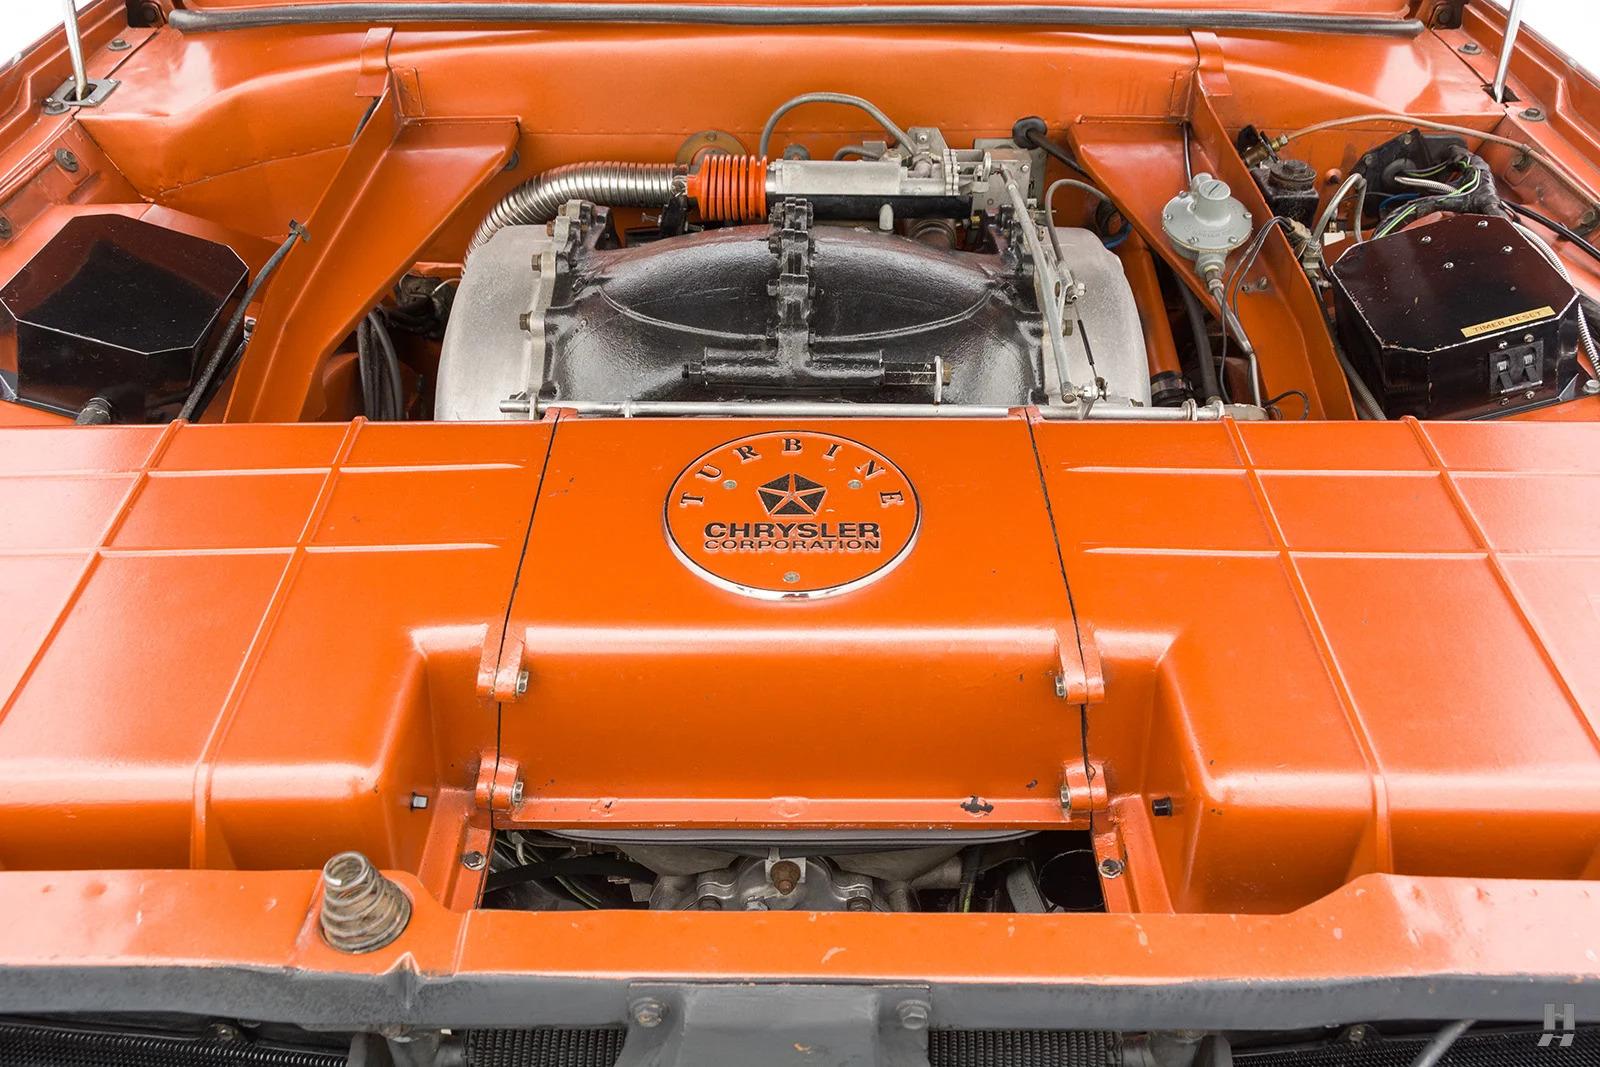 1963 Chrysler Turbine Car engine bay front